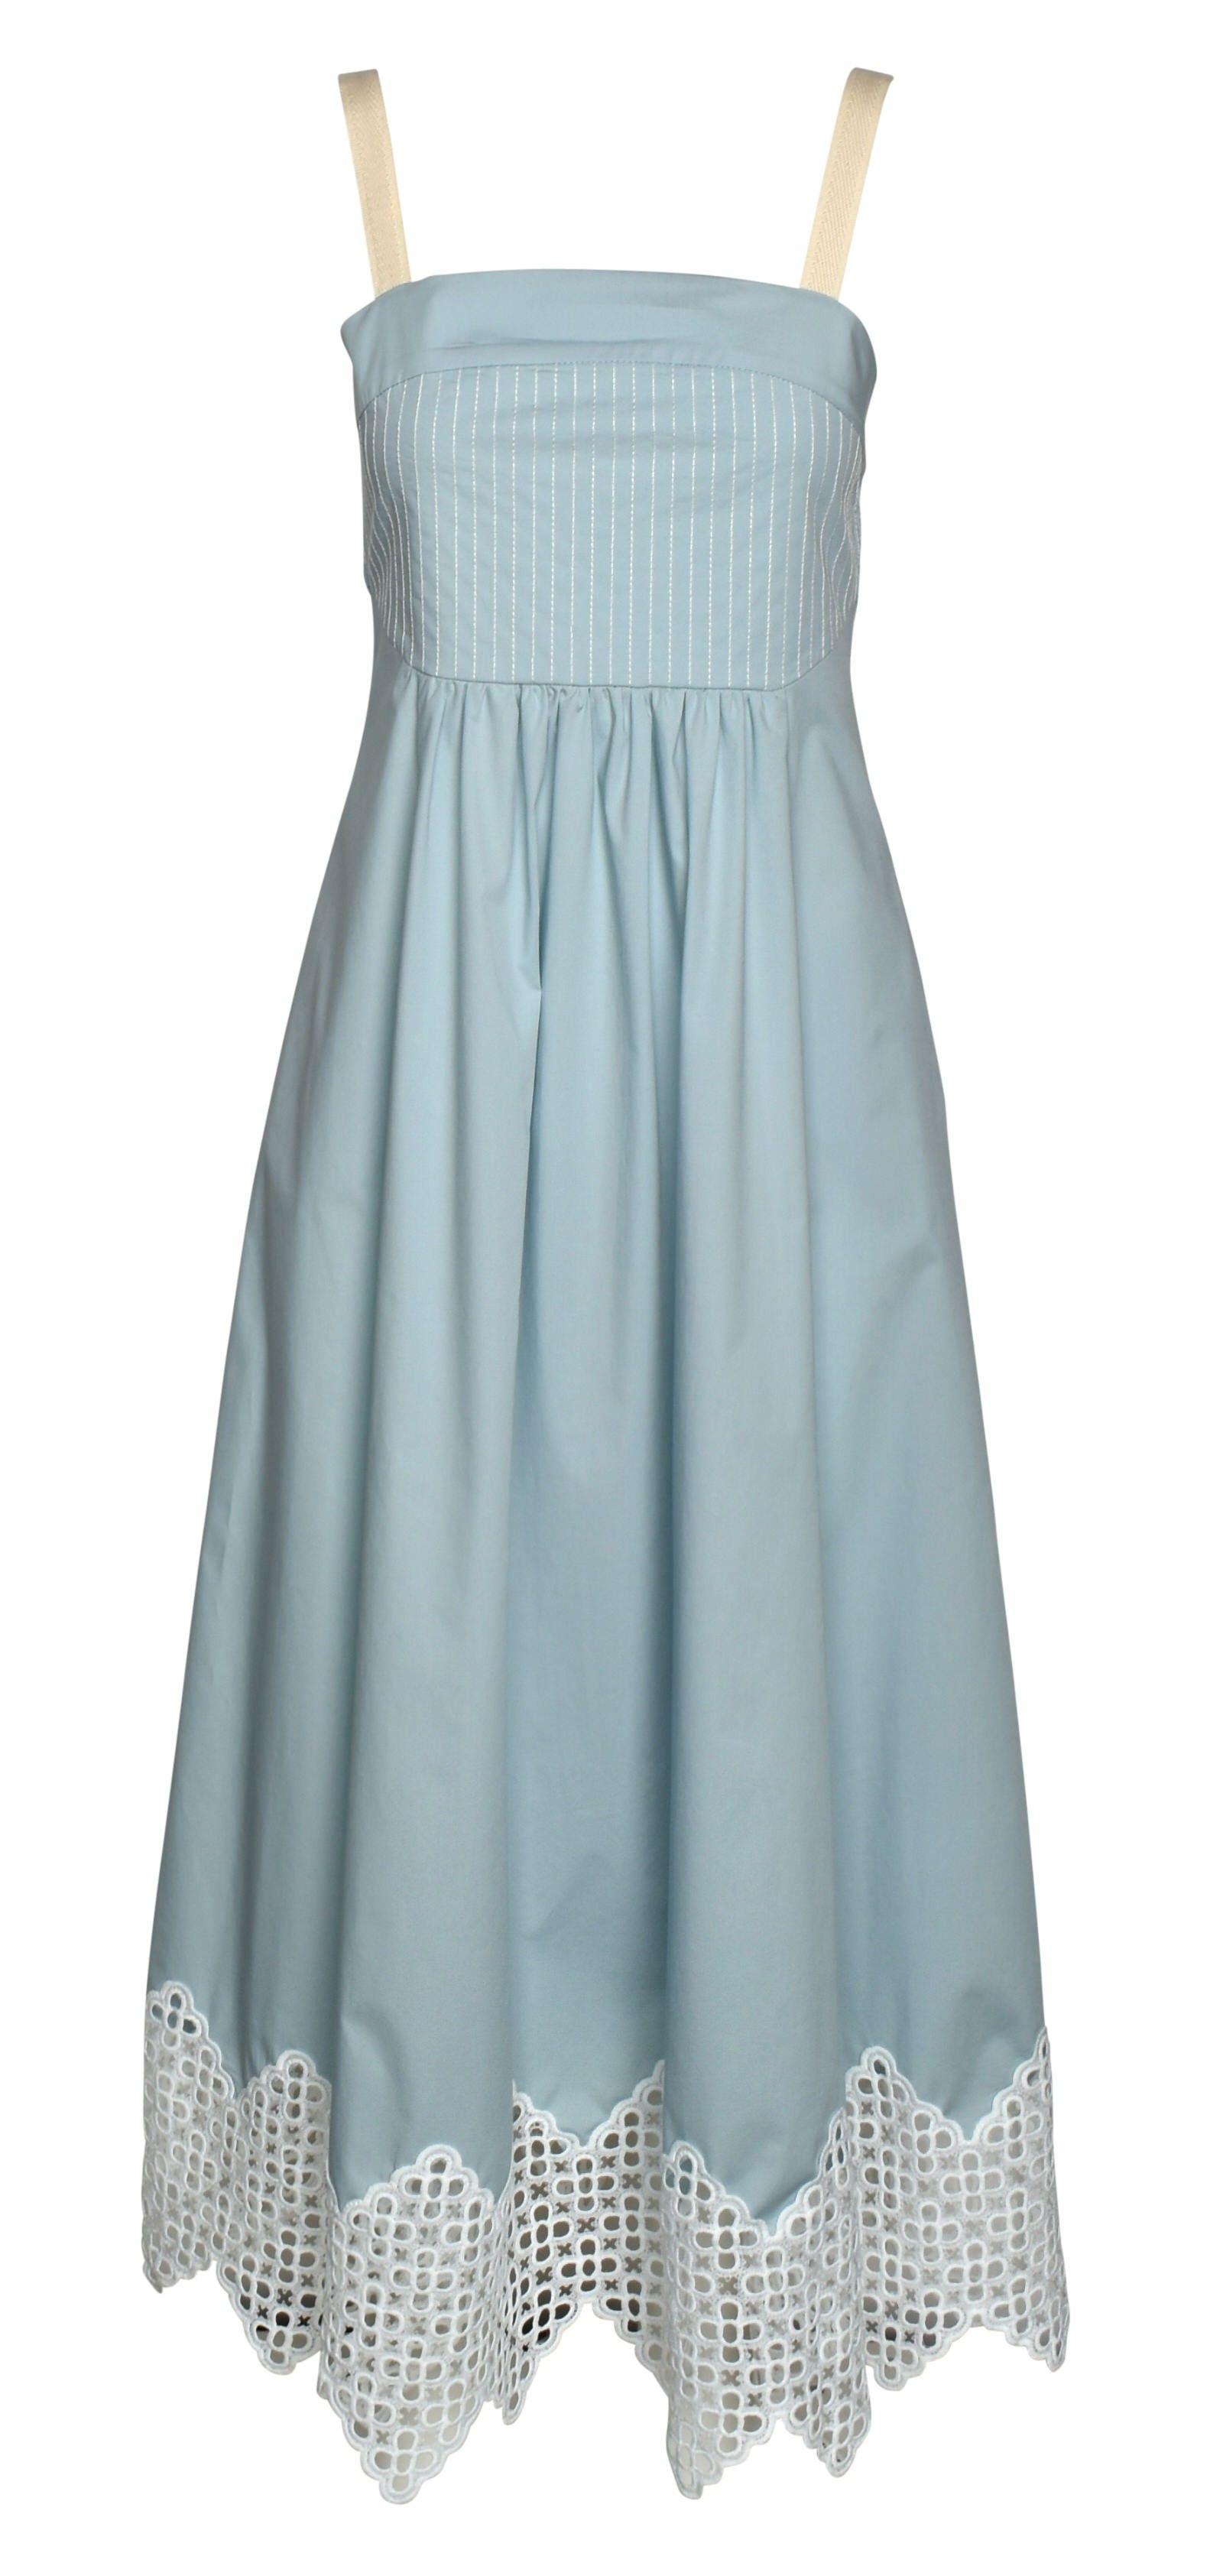 BEATRICE B - Damen Kleid - Abito Ice Blue